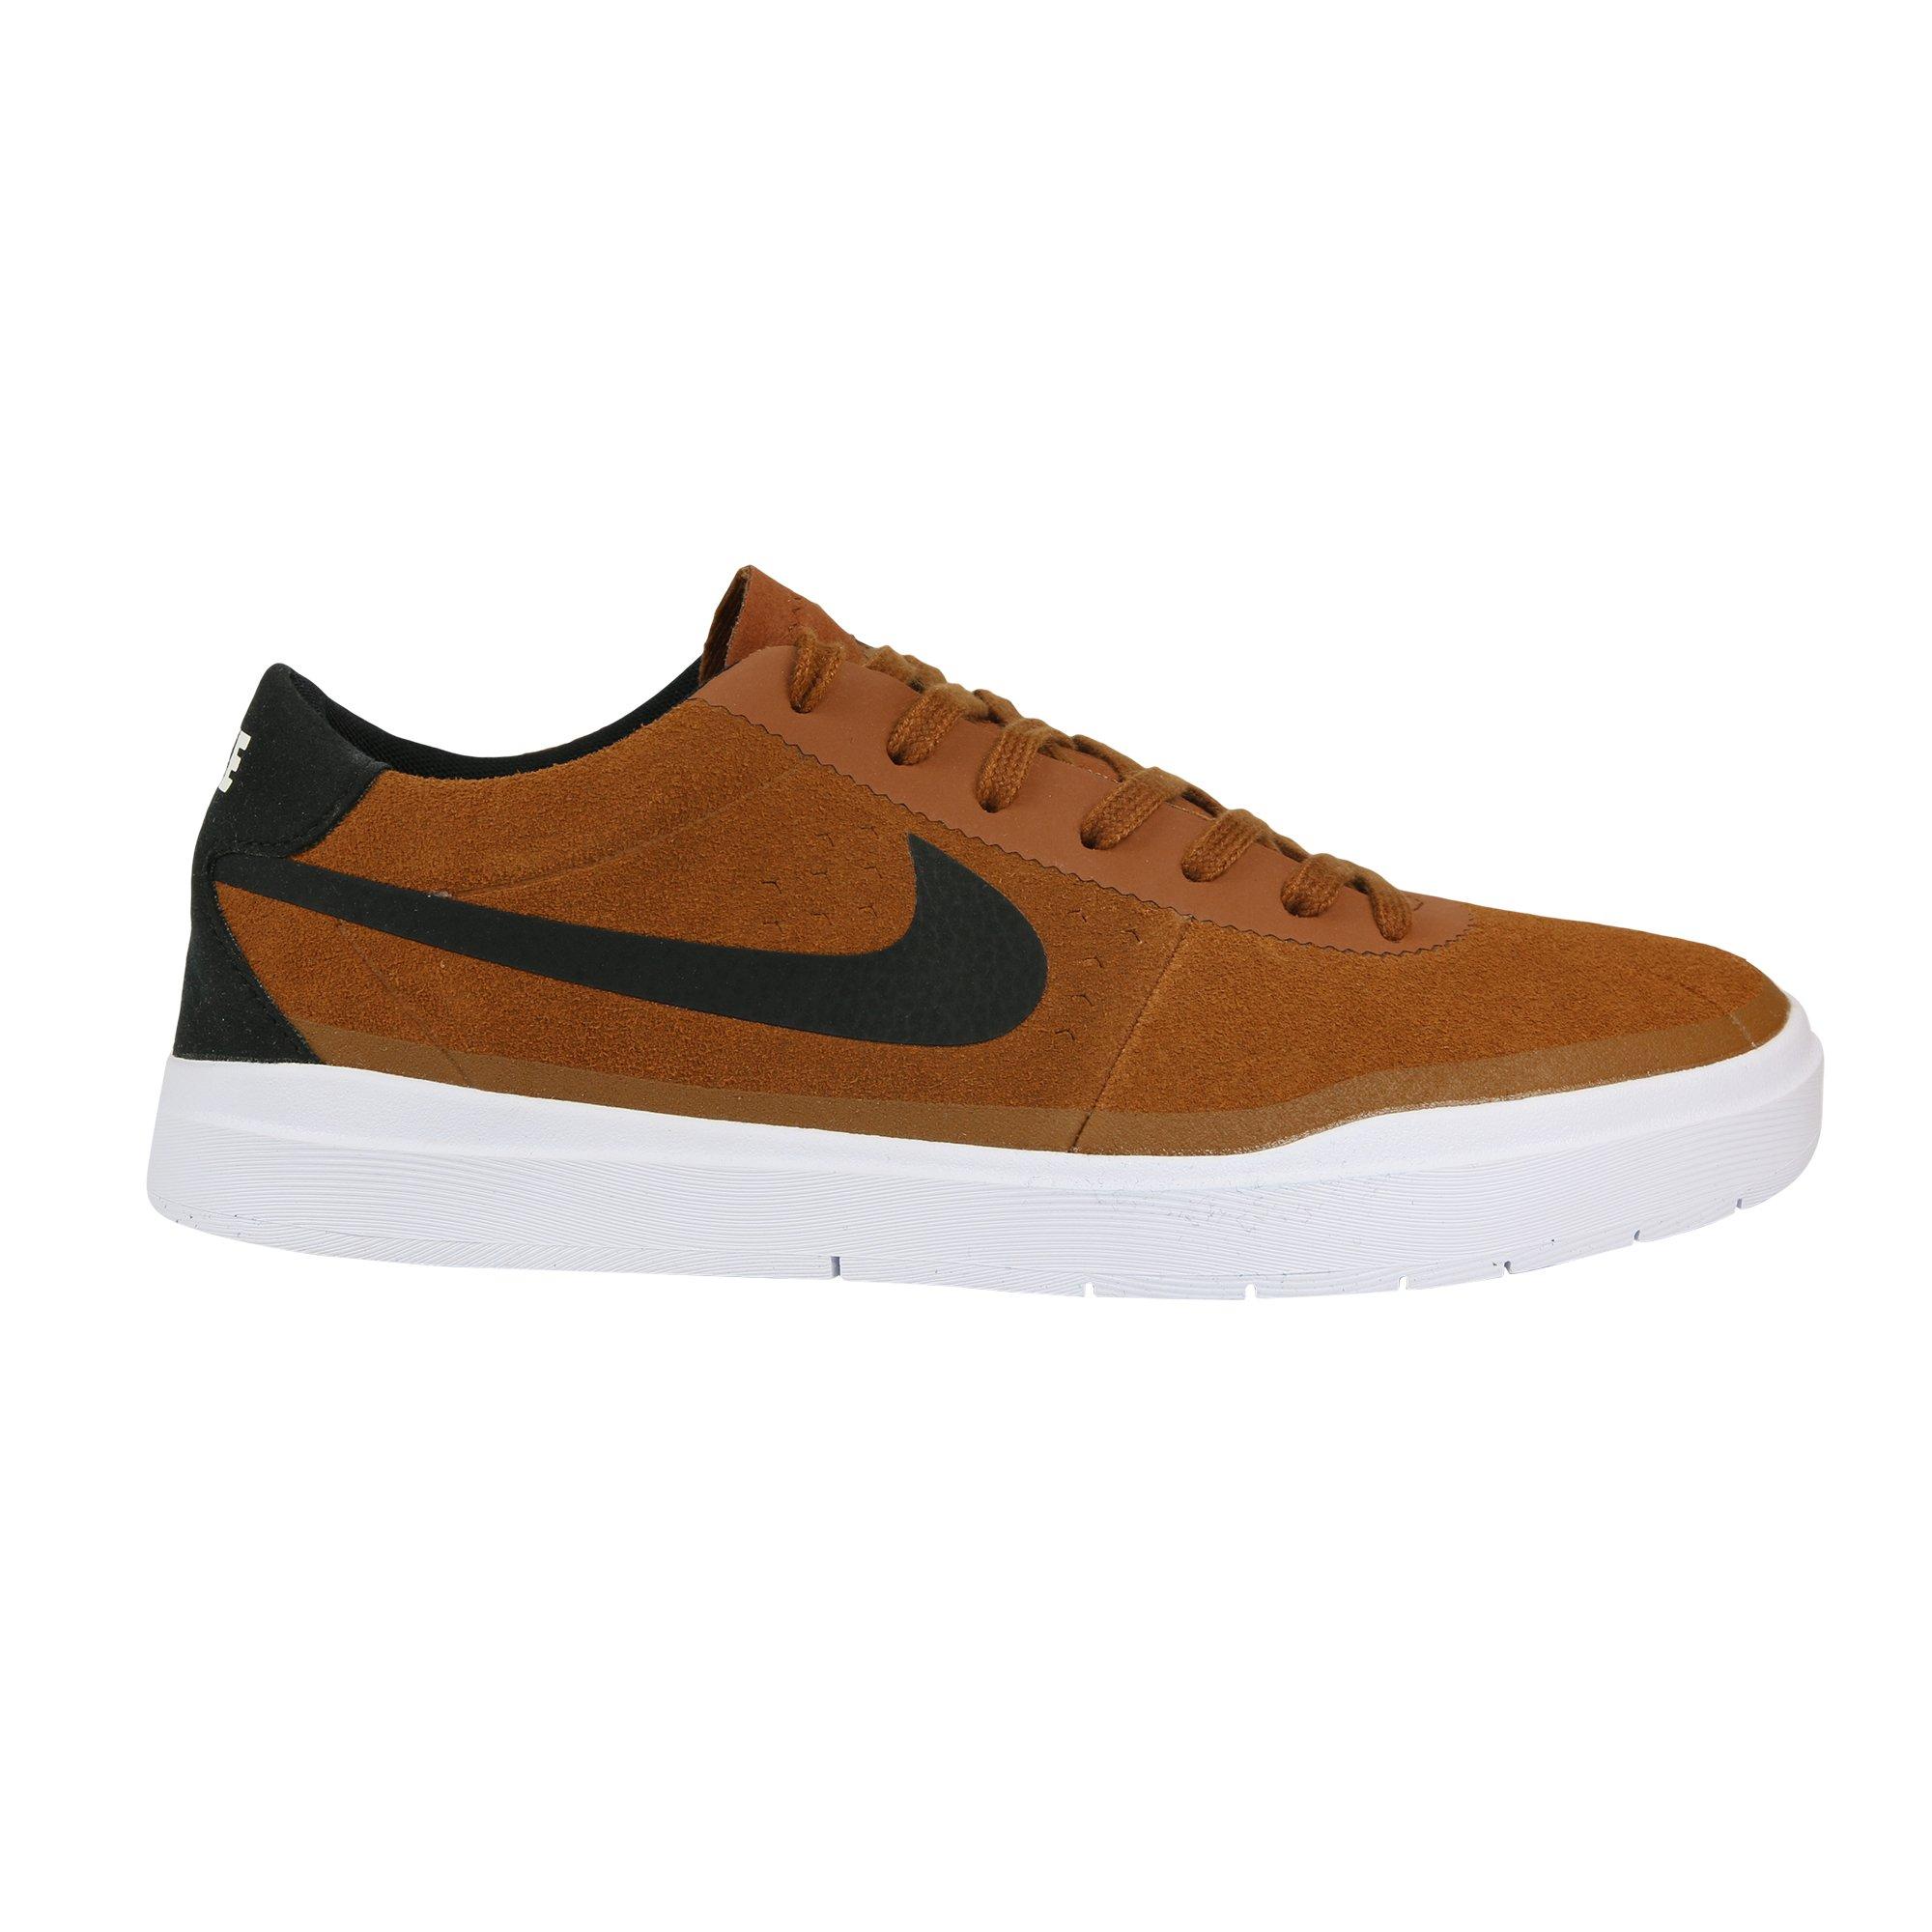 3762c7582a860 Galleon - Nike Men's Bruin Sb Hyperfeel Hazelnut/Black White Ankle ...